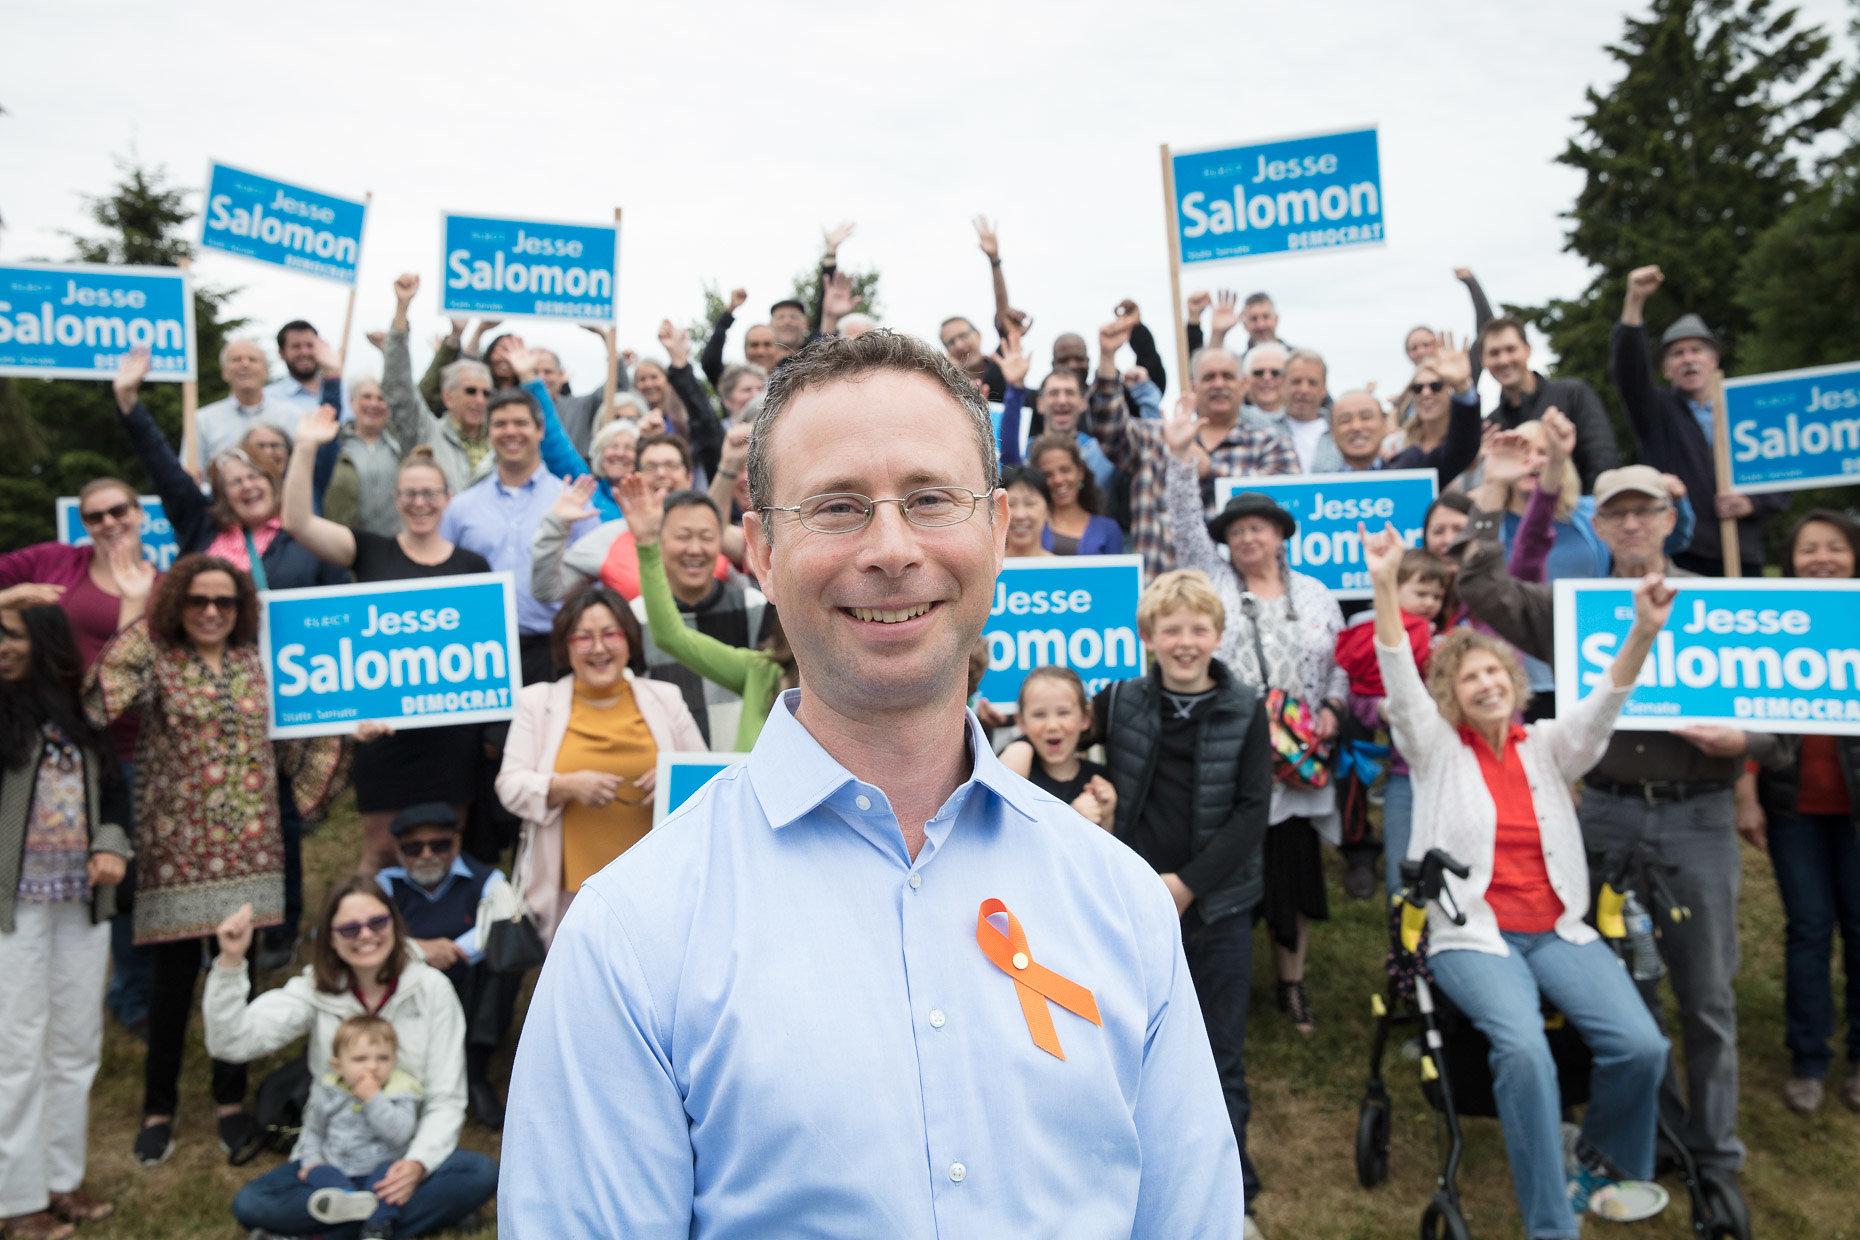 jesse-salomon-and supporters.jpg